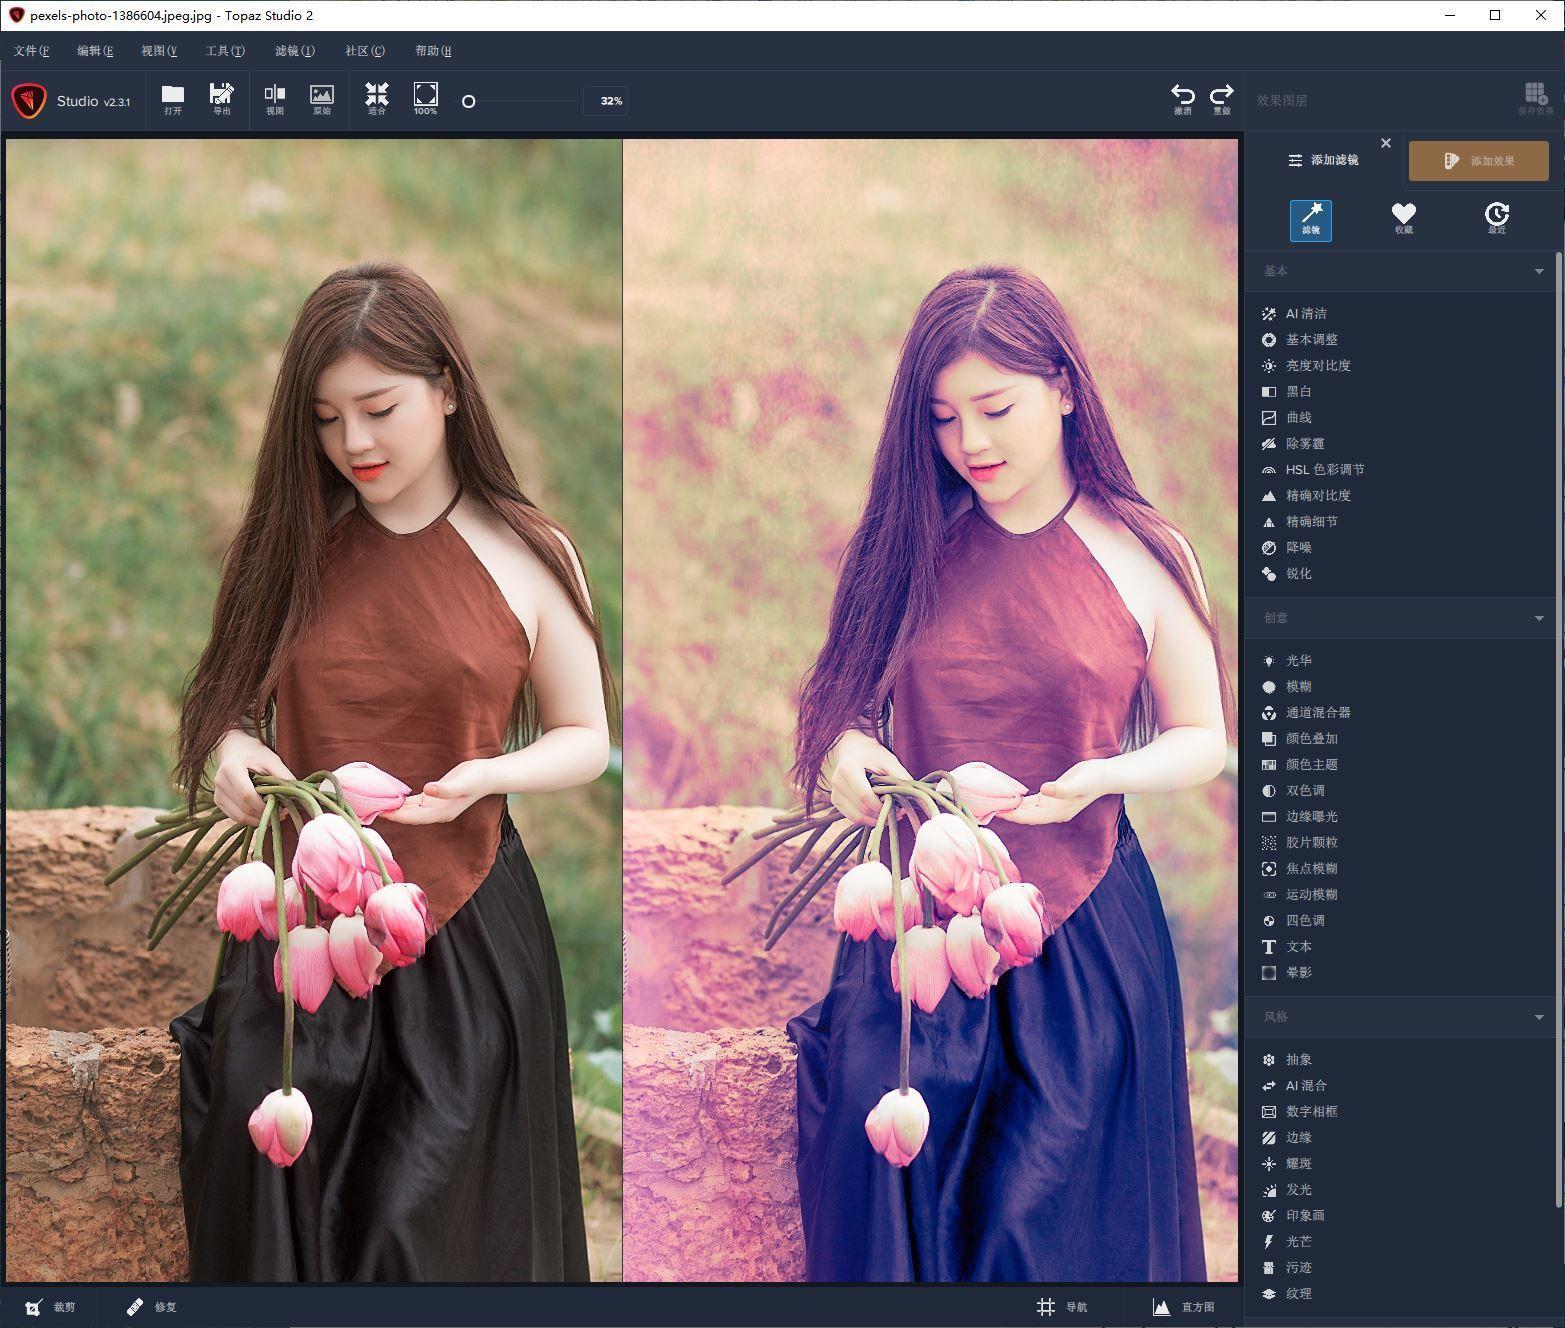 VIP资源-创意照片编辑软件 Topaz Studio 2.3.2 WIN 中文汉化版(1)